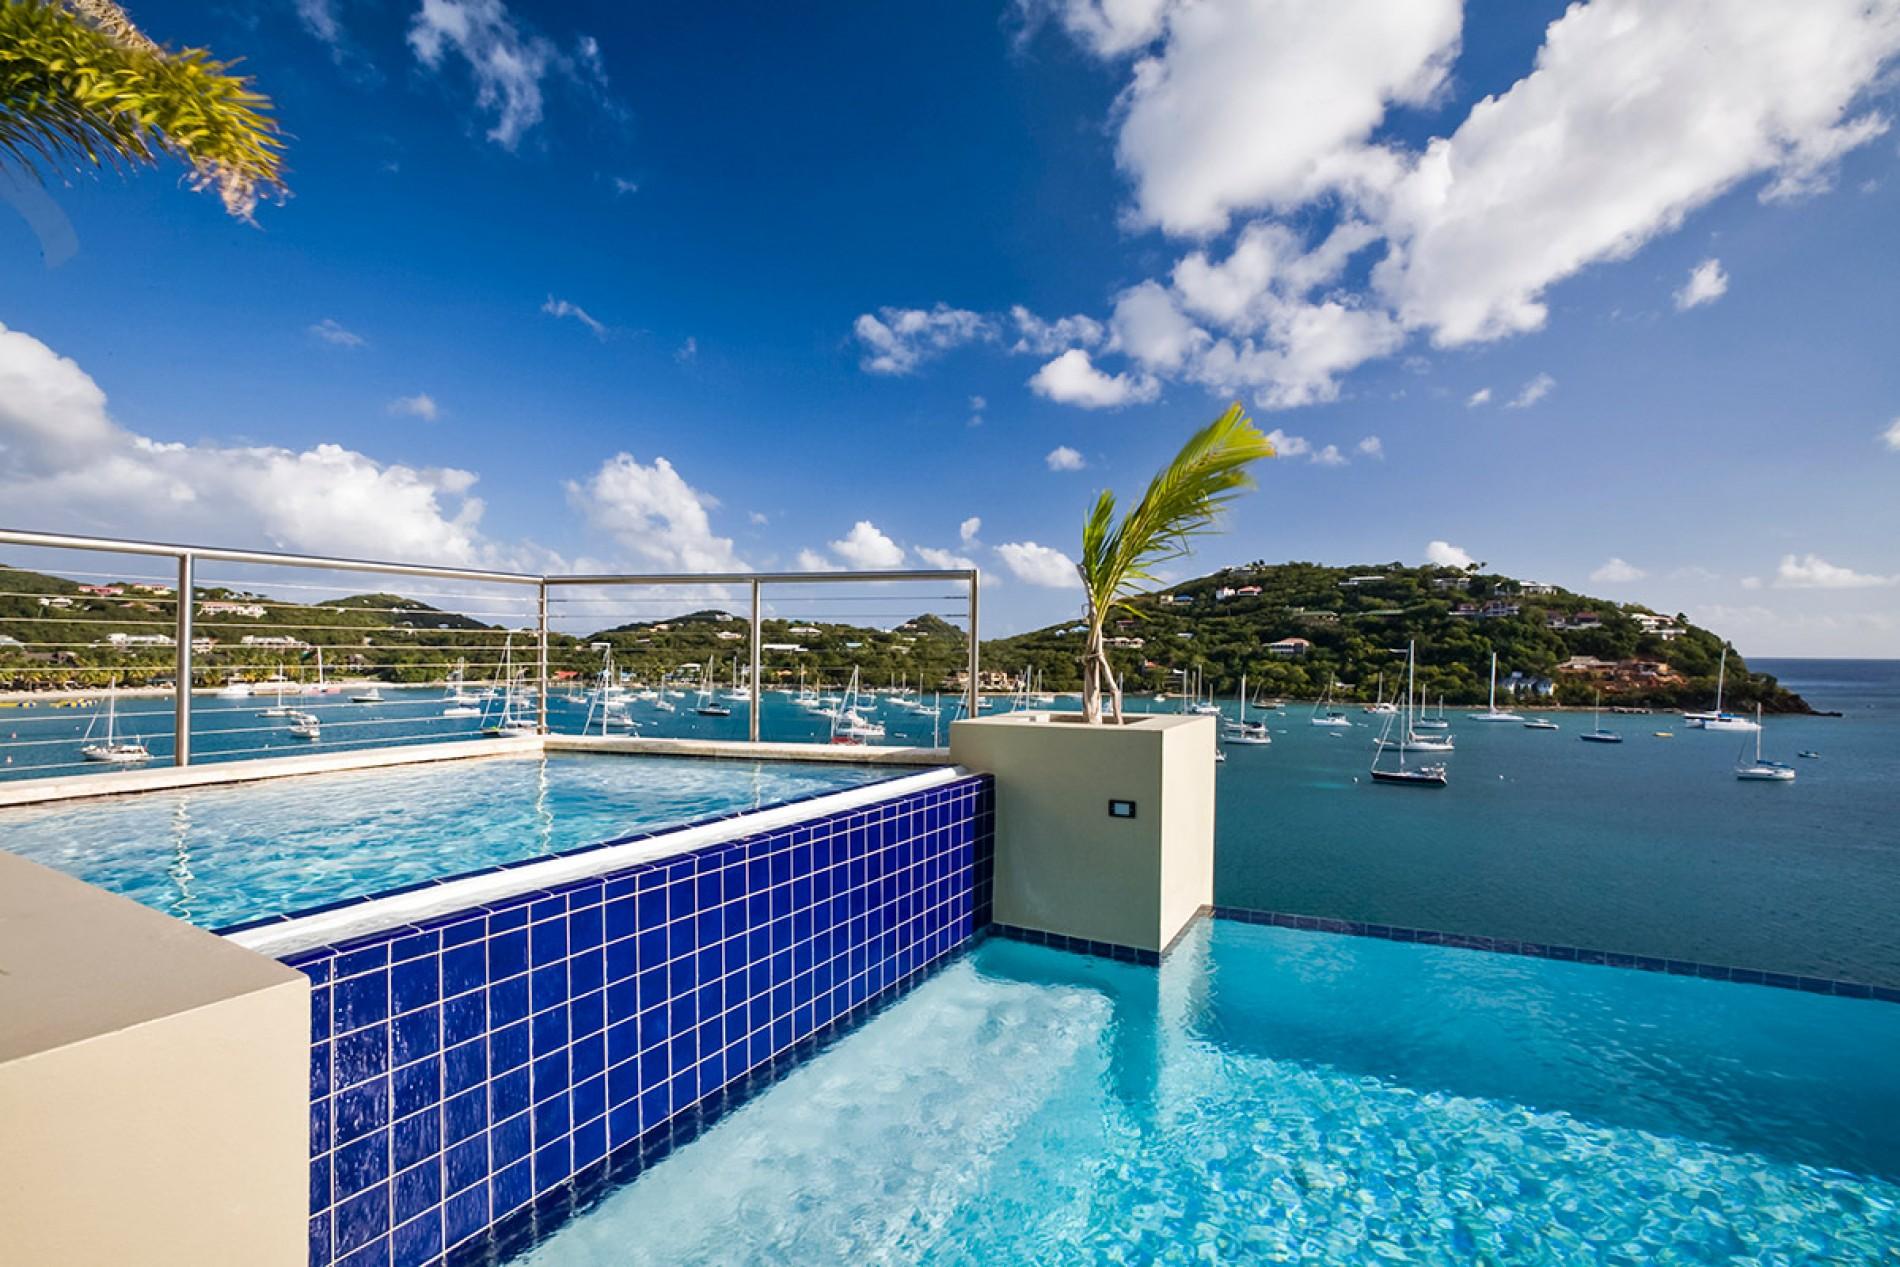 Best Kitchen Gallery: Vi Friendship Villa Us Virgin Islands Exceptional Villas of Villas For Rent St John Usvi  on rachelxblog.com